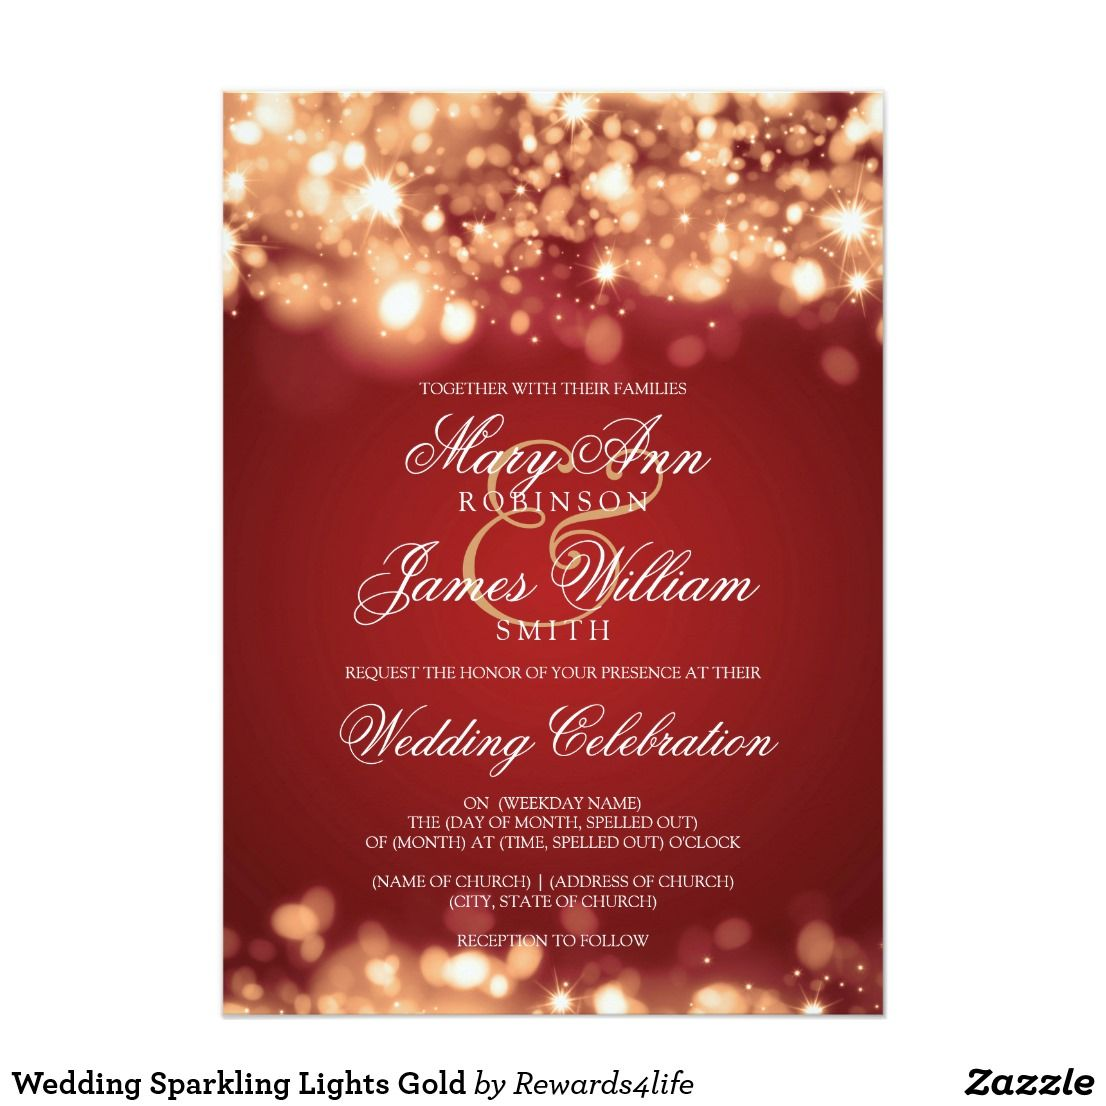 Wedding Sparkling Lights Gold Invitation | Pinterest | Elegant ...